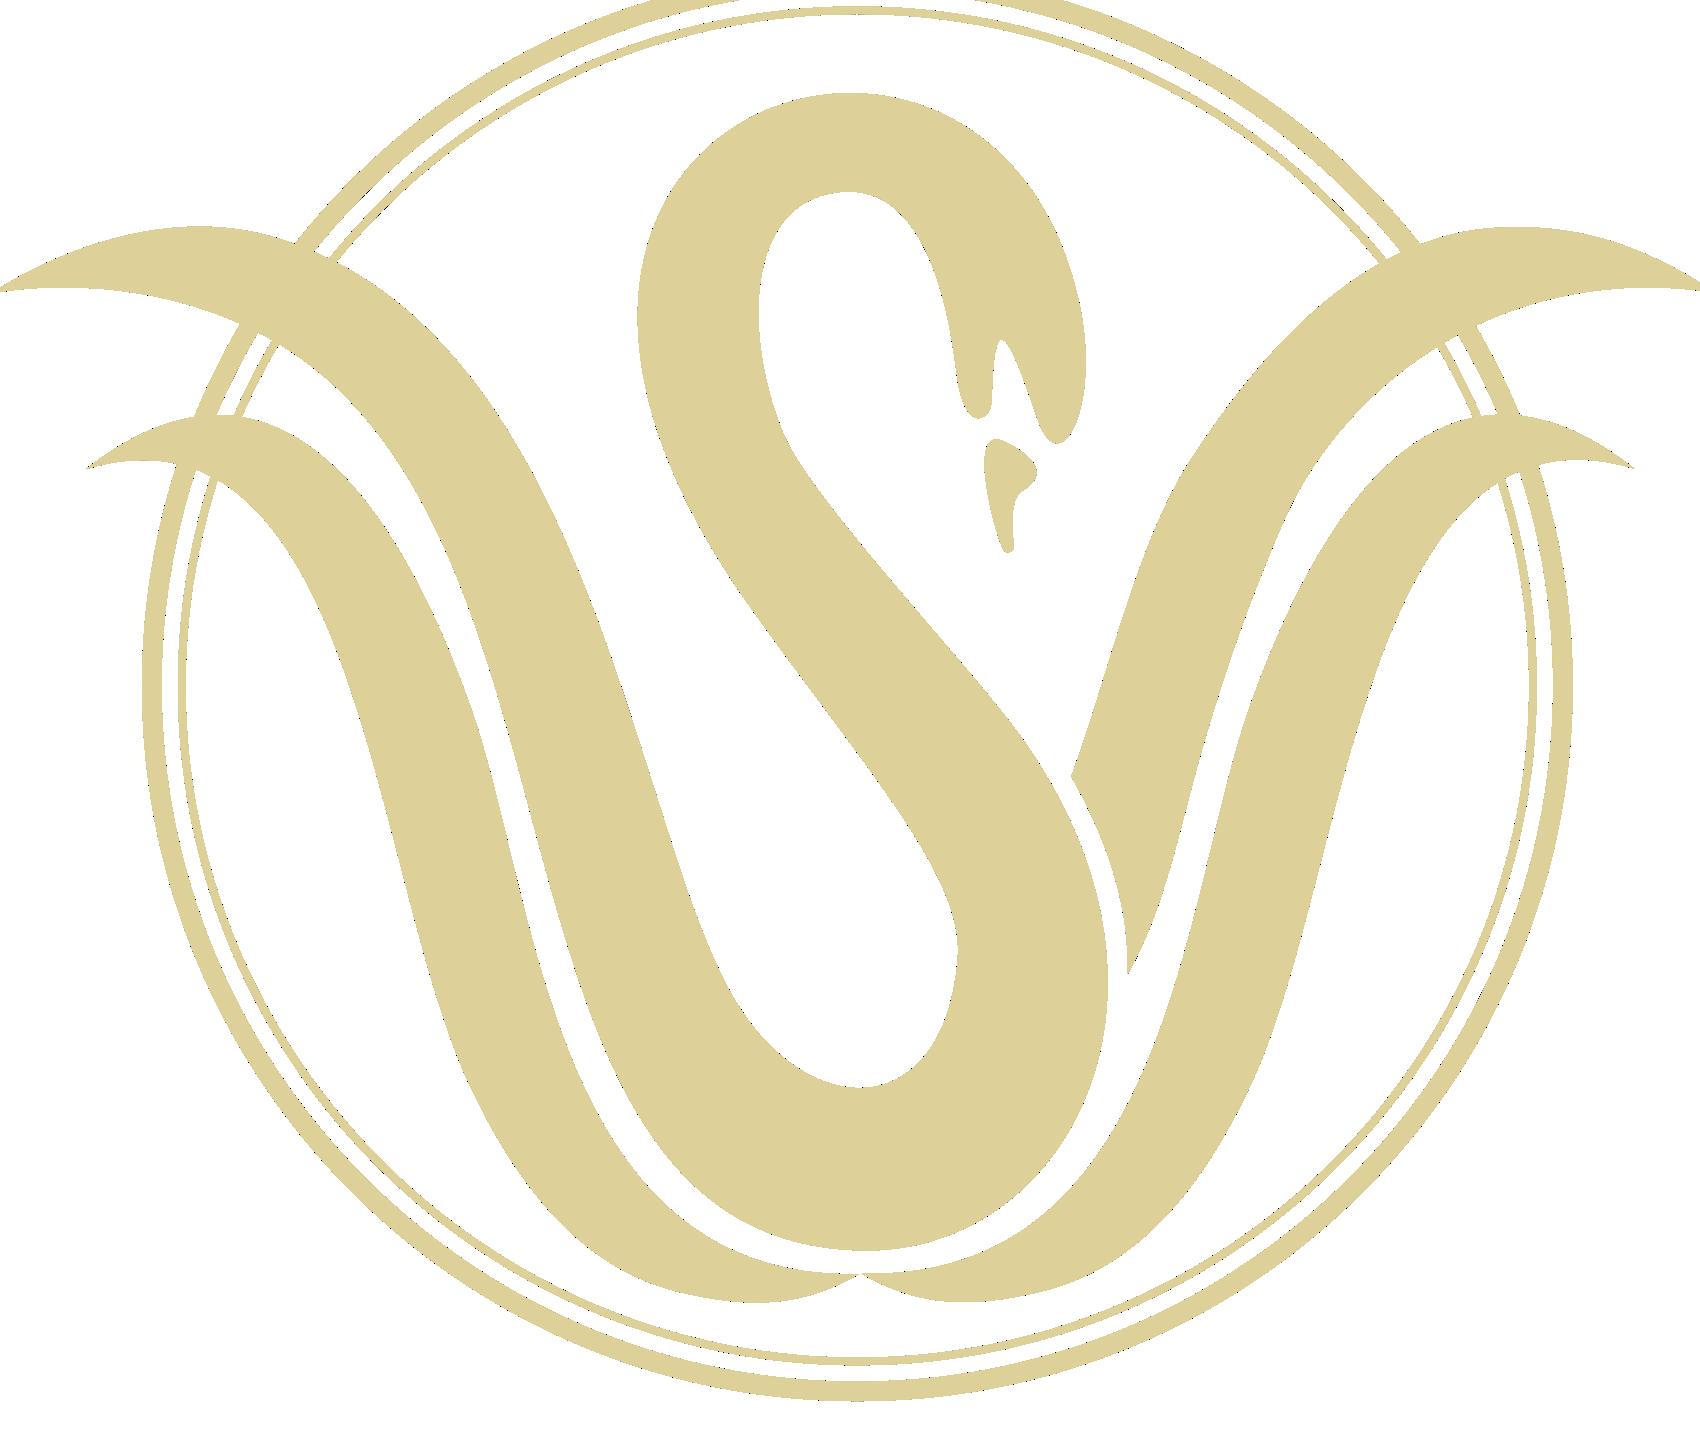 Hattyú Medicina ikon